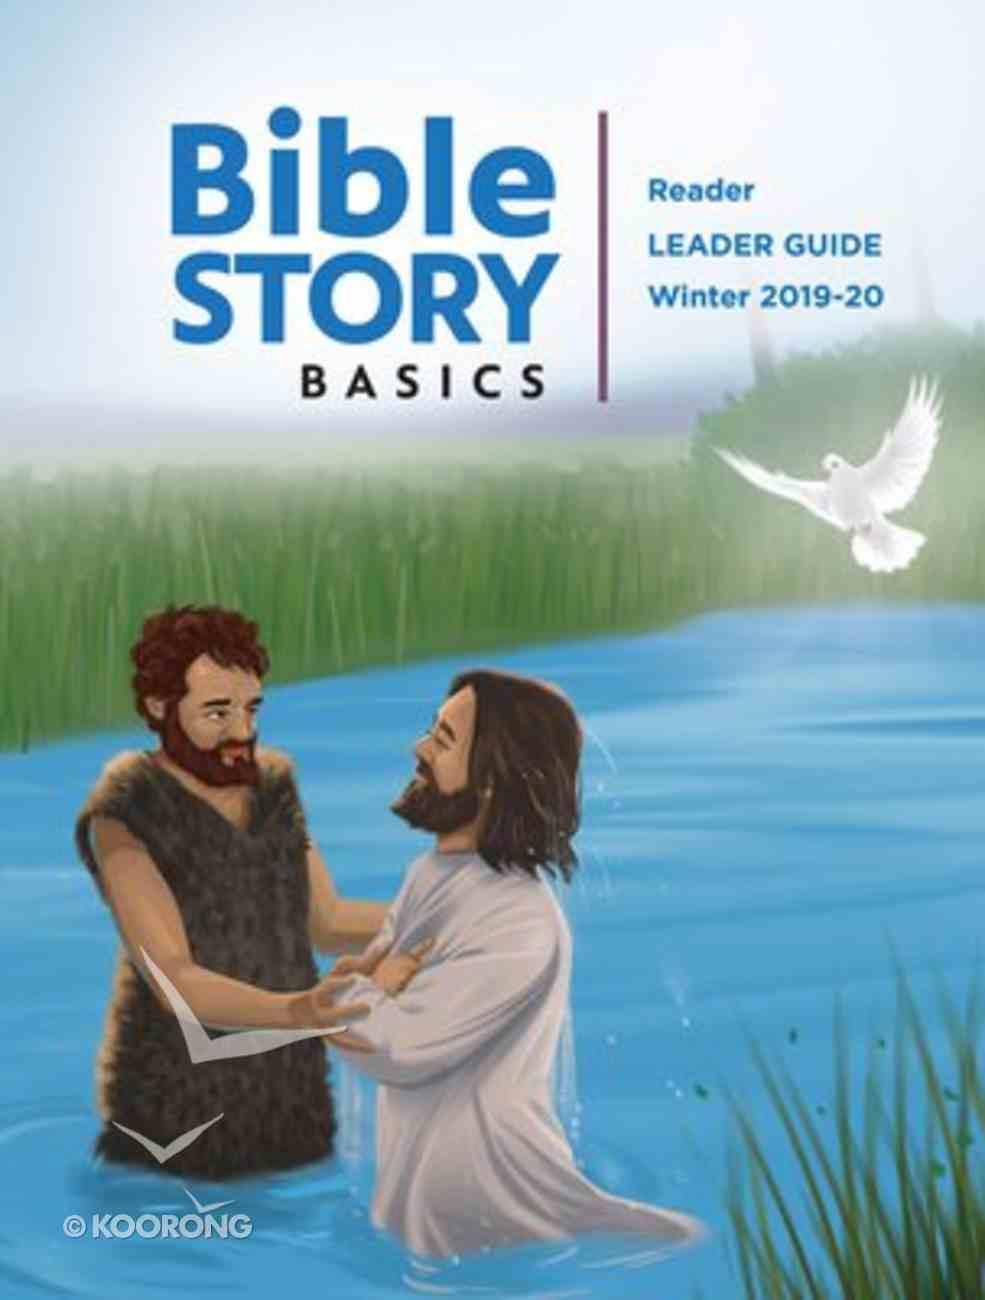 Bible Story Basics Winter 2019-2020 (Reader's Leader Guide) Paperback